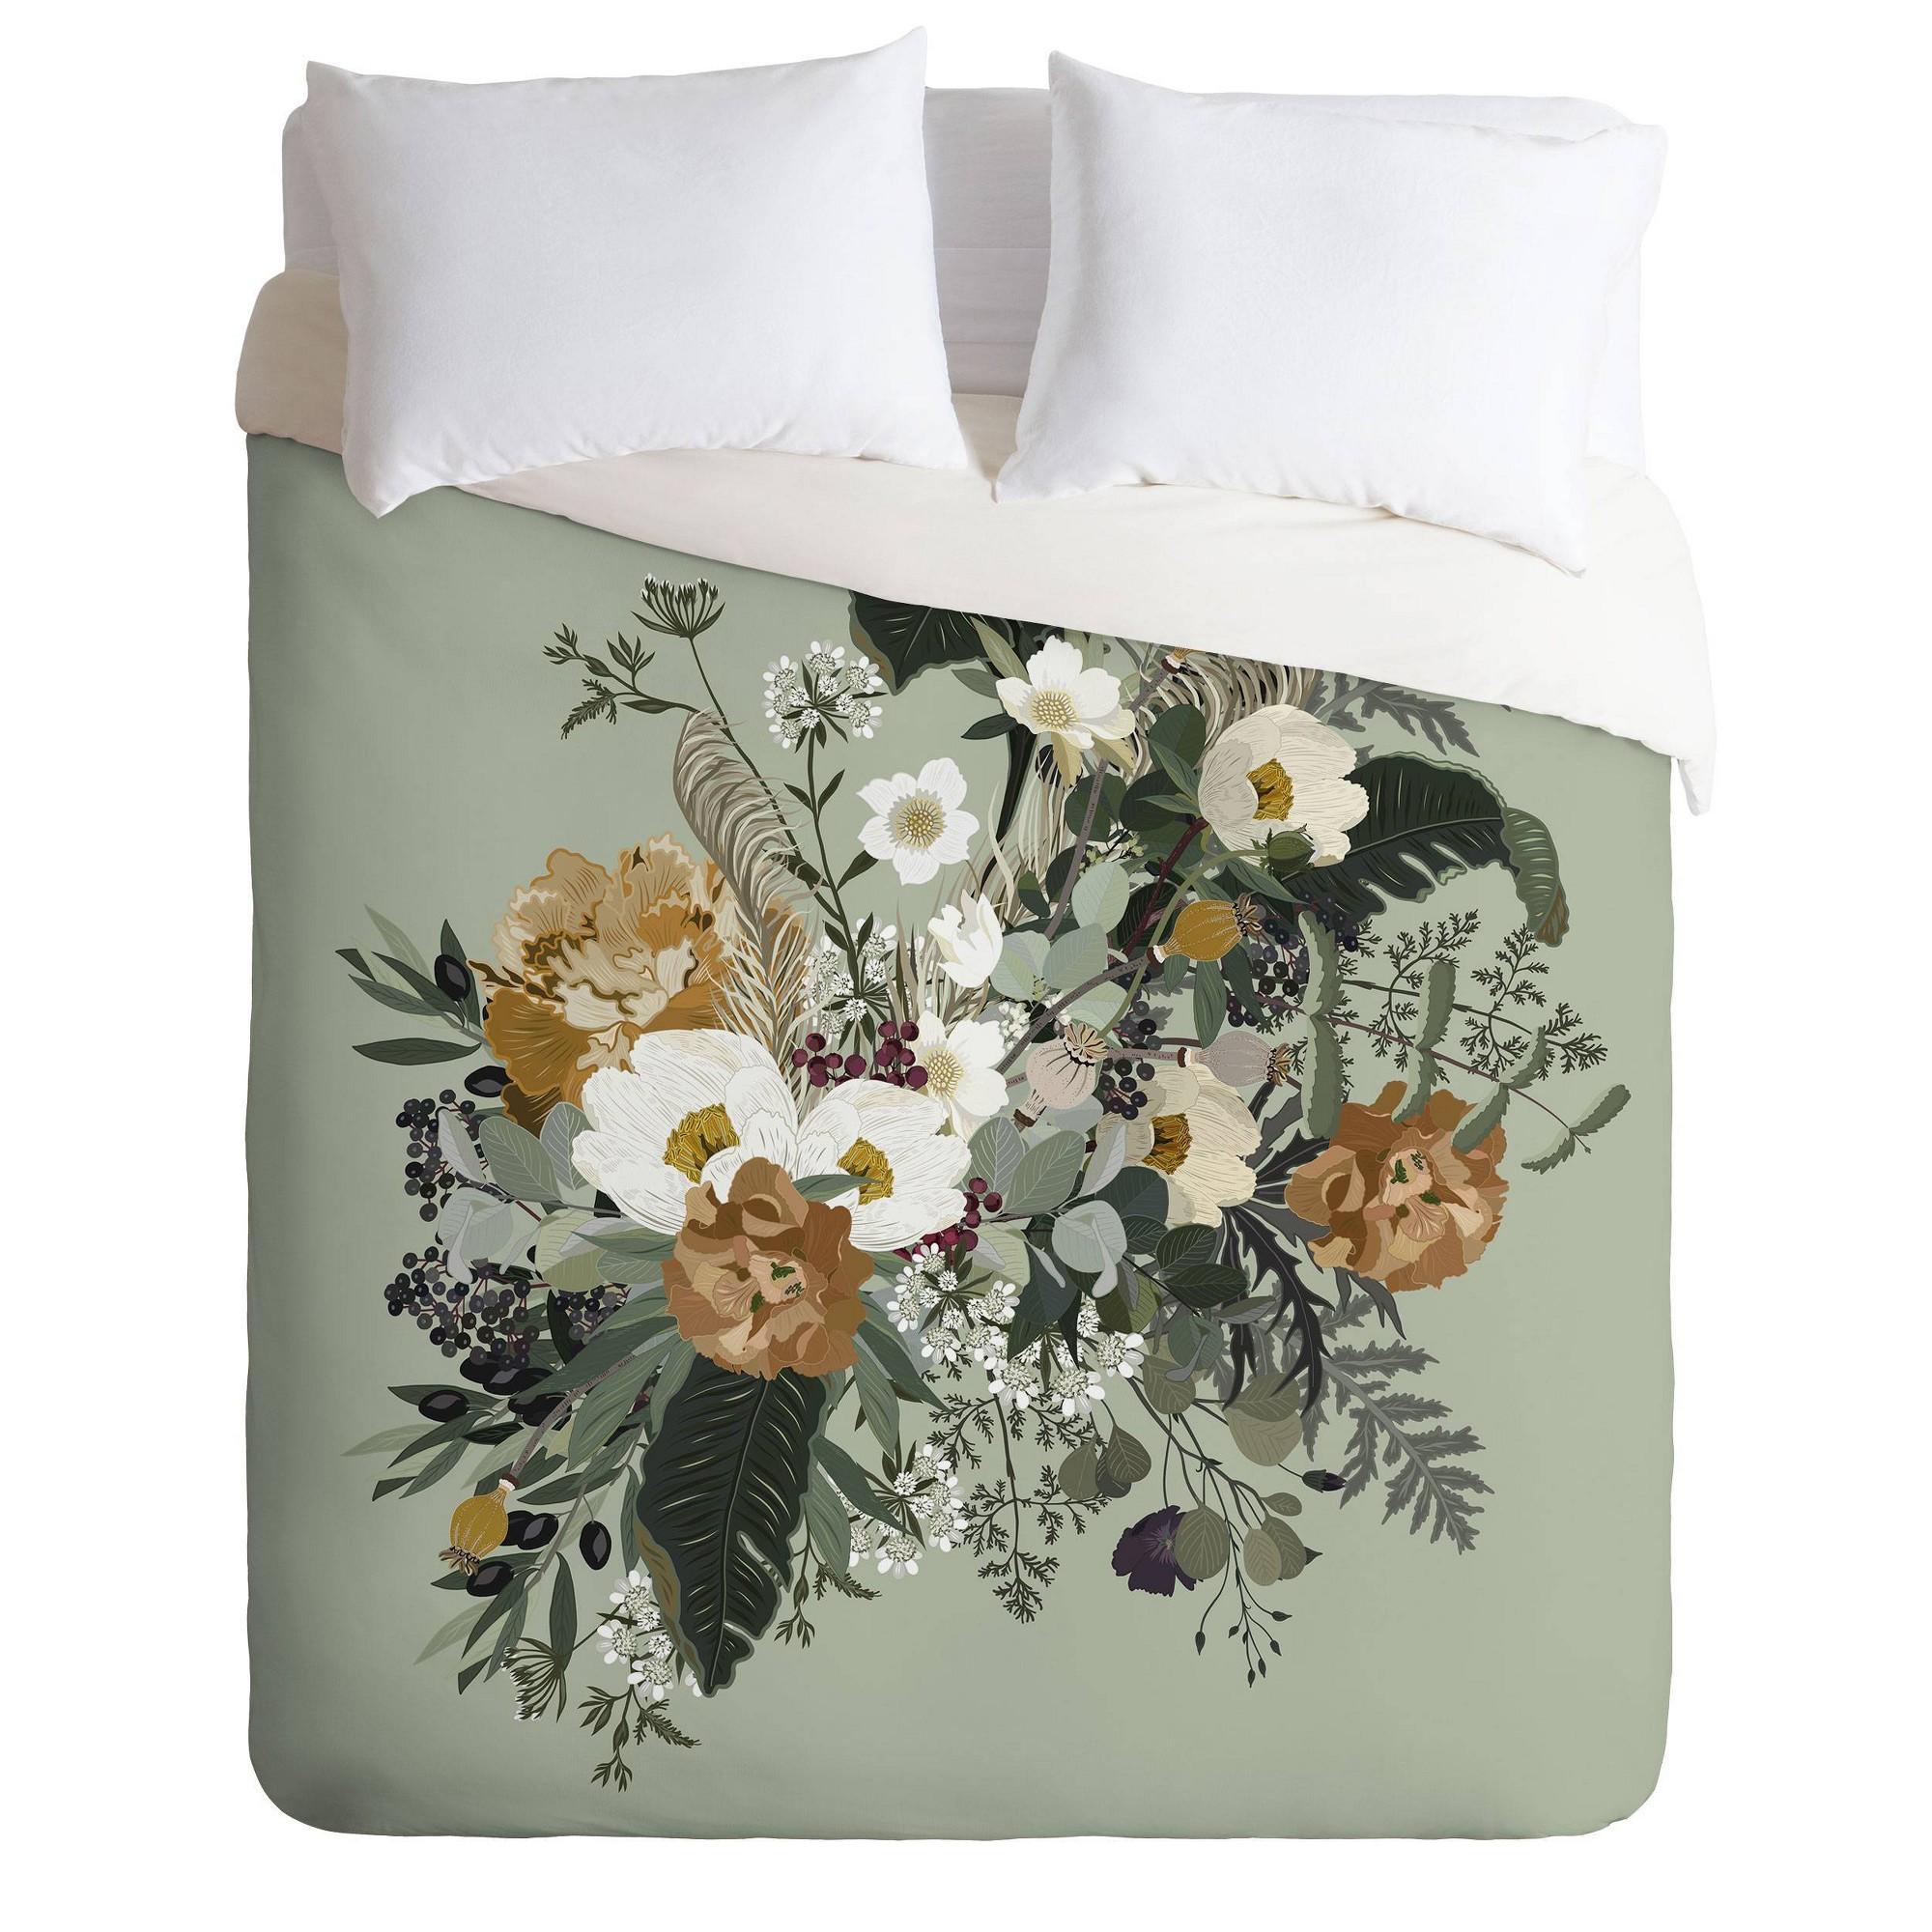 Full/Queen Iveta Abolina Duvet Cover & Sham Set Green - Deny Designs